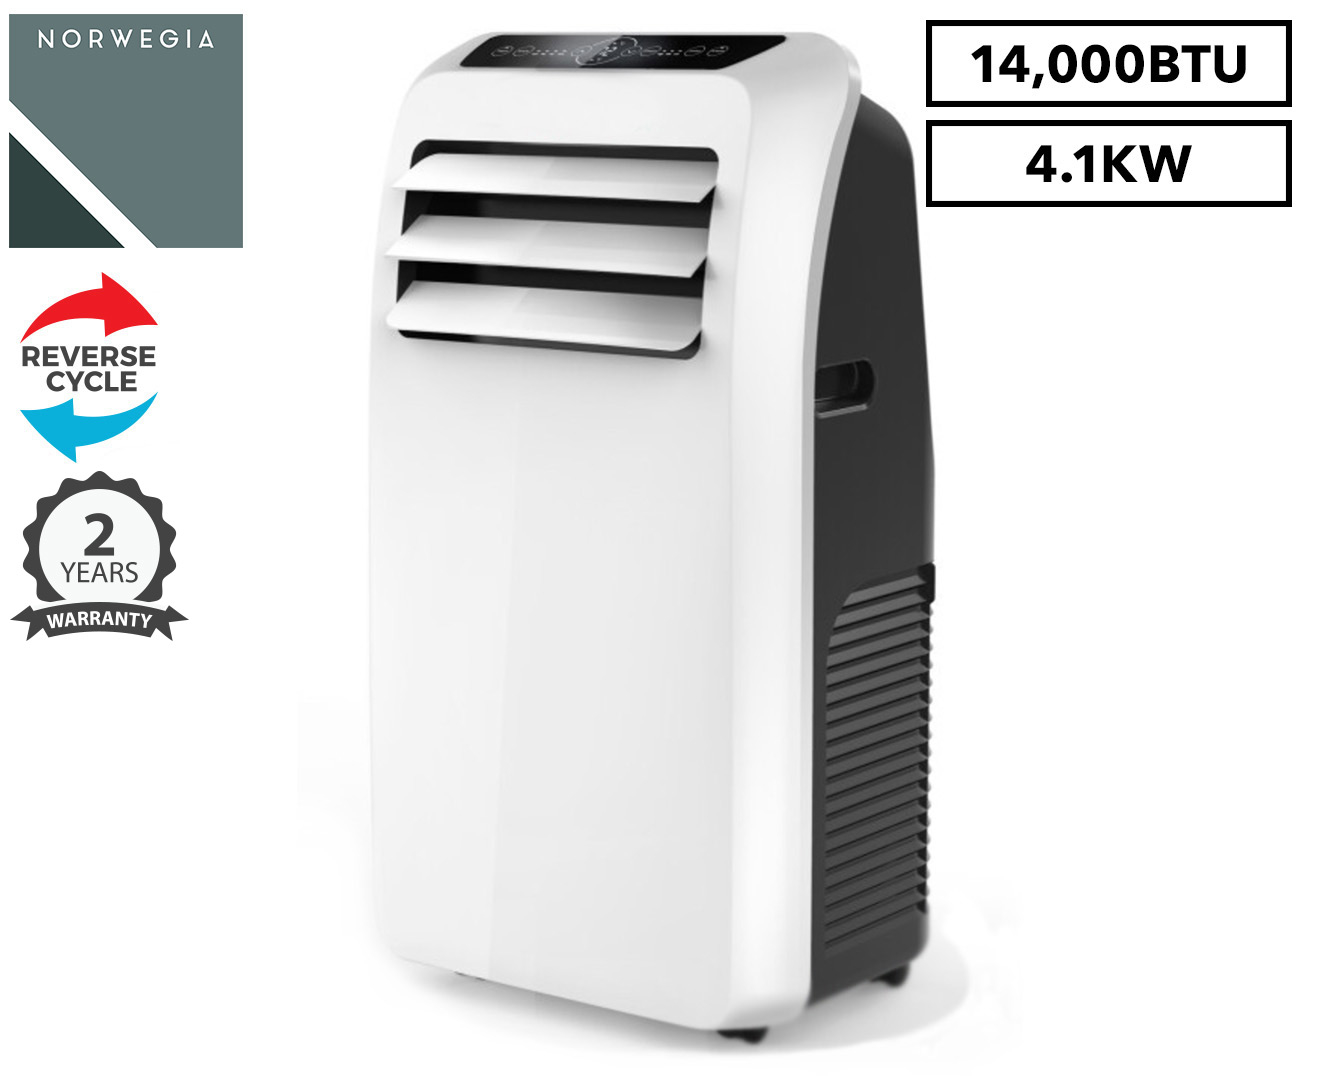 norwegia 4 1kw reverse cycle portable air conditioner  14 000btu